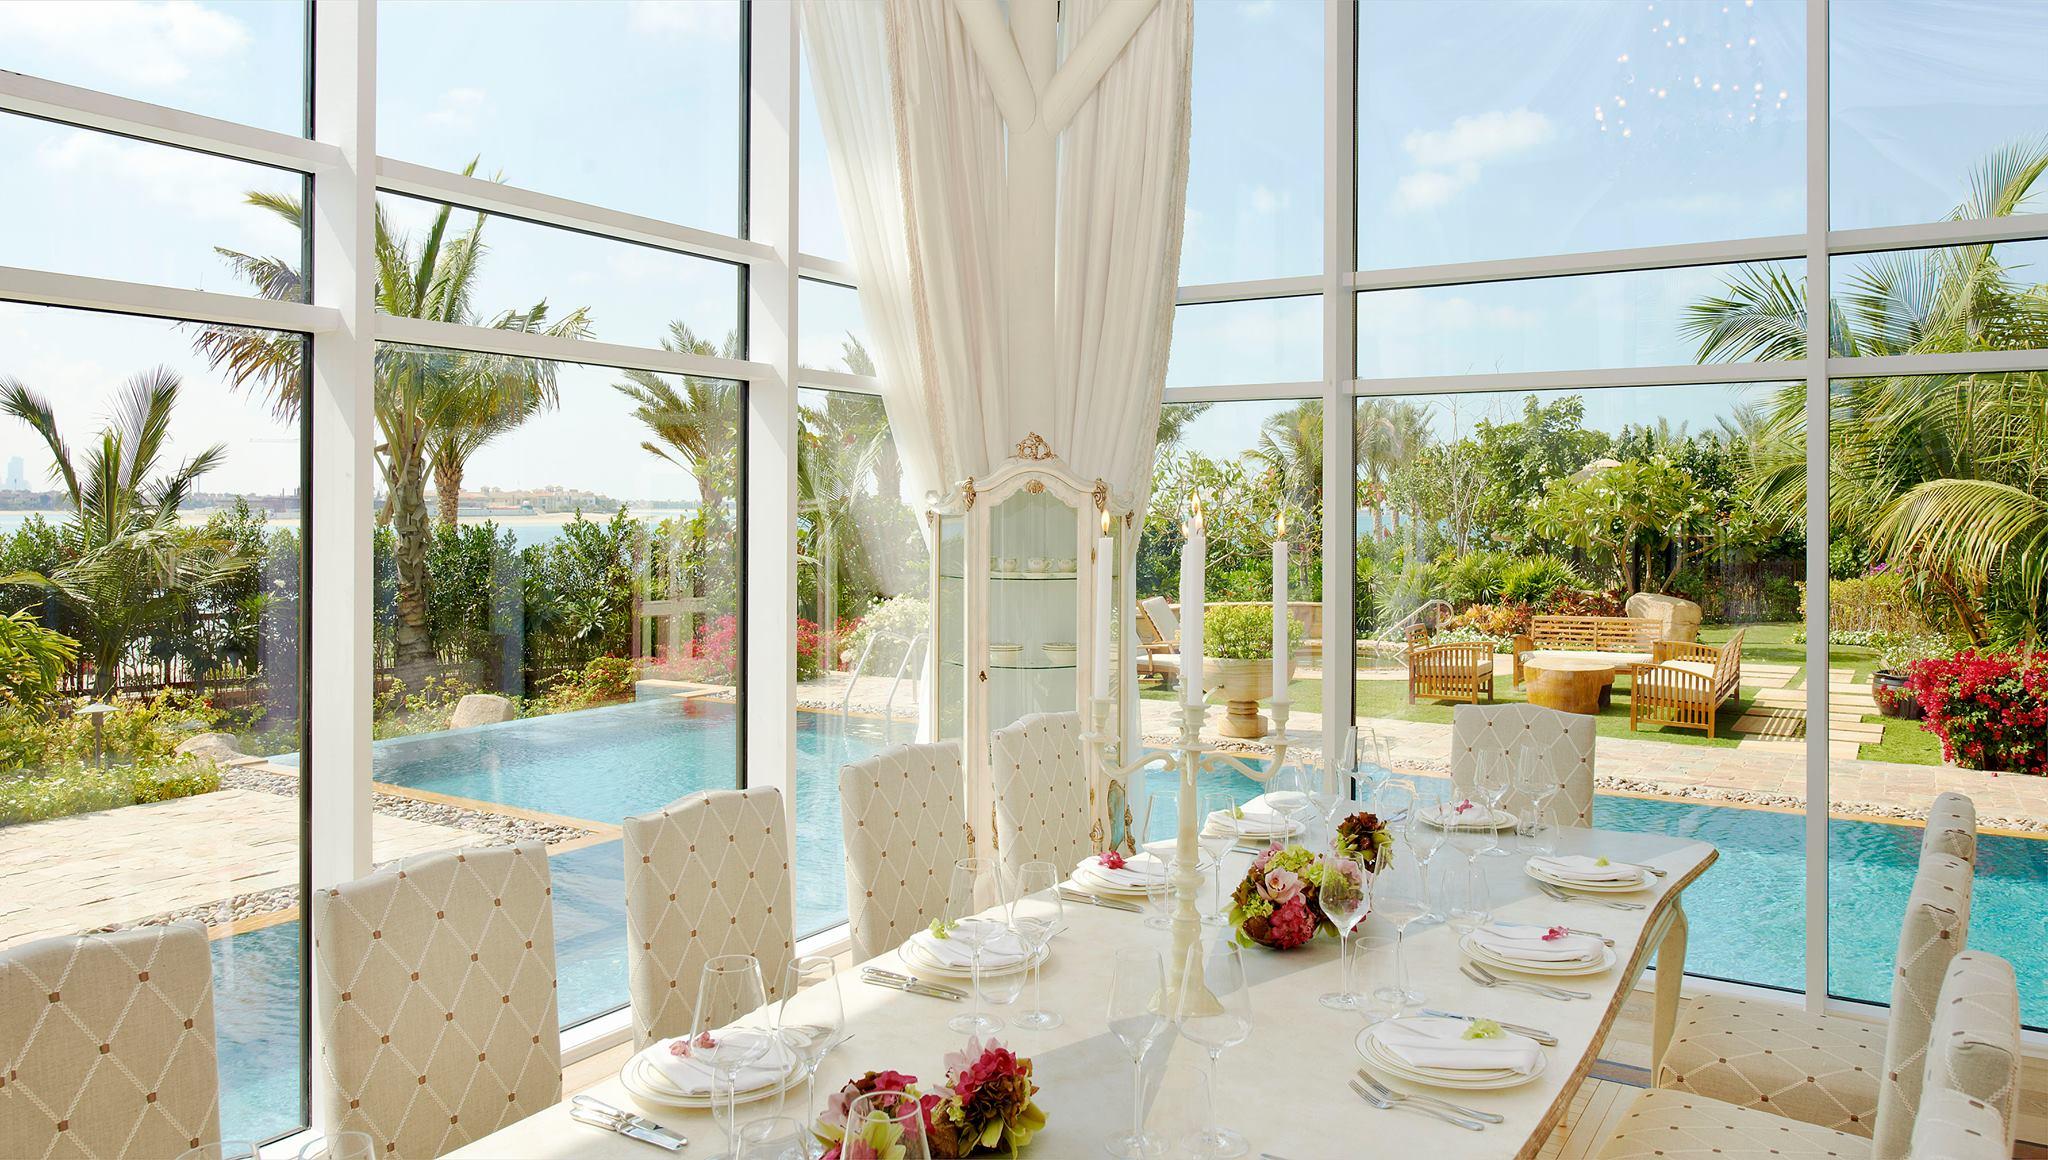 sofitel-dubai-the-palm-resort-and-spa-dubai-uae-11